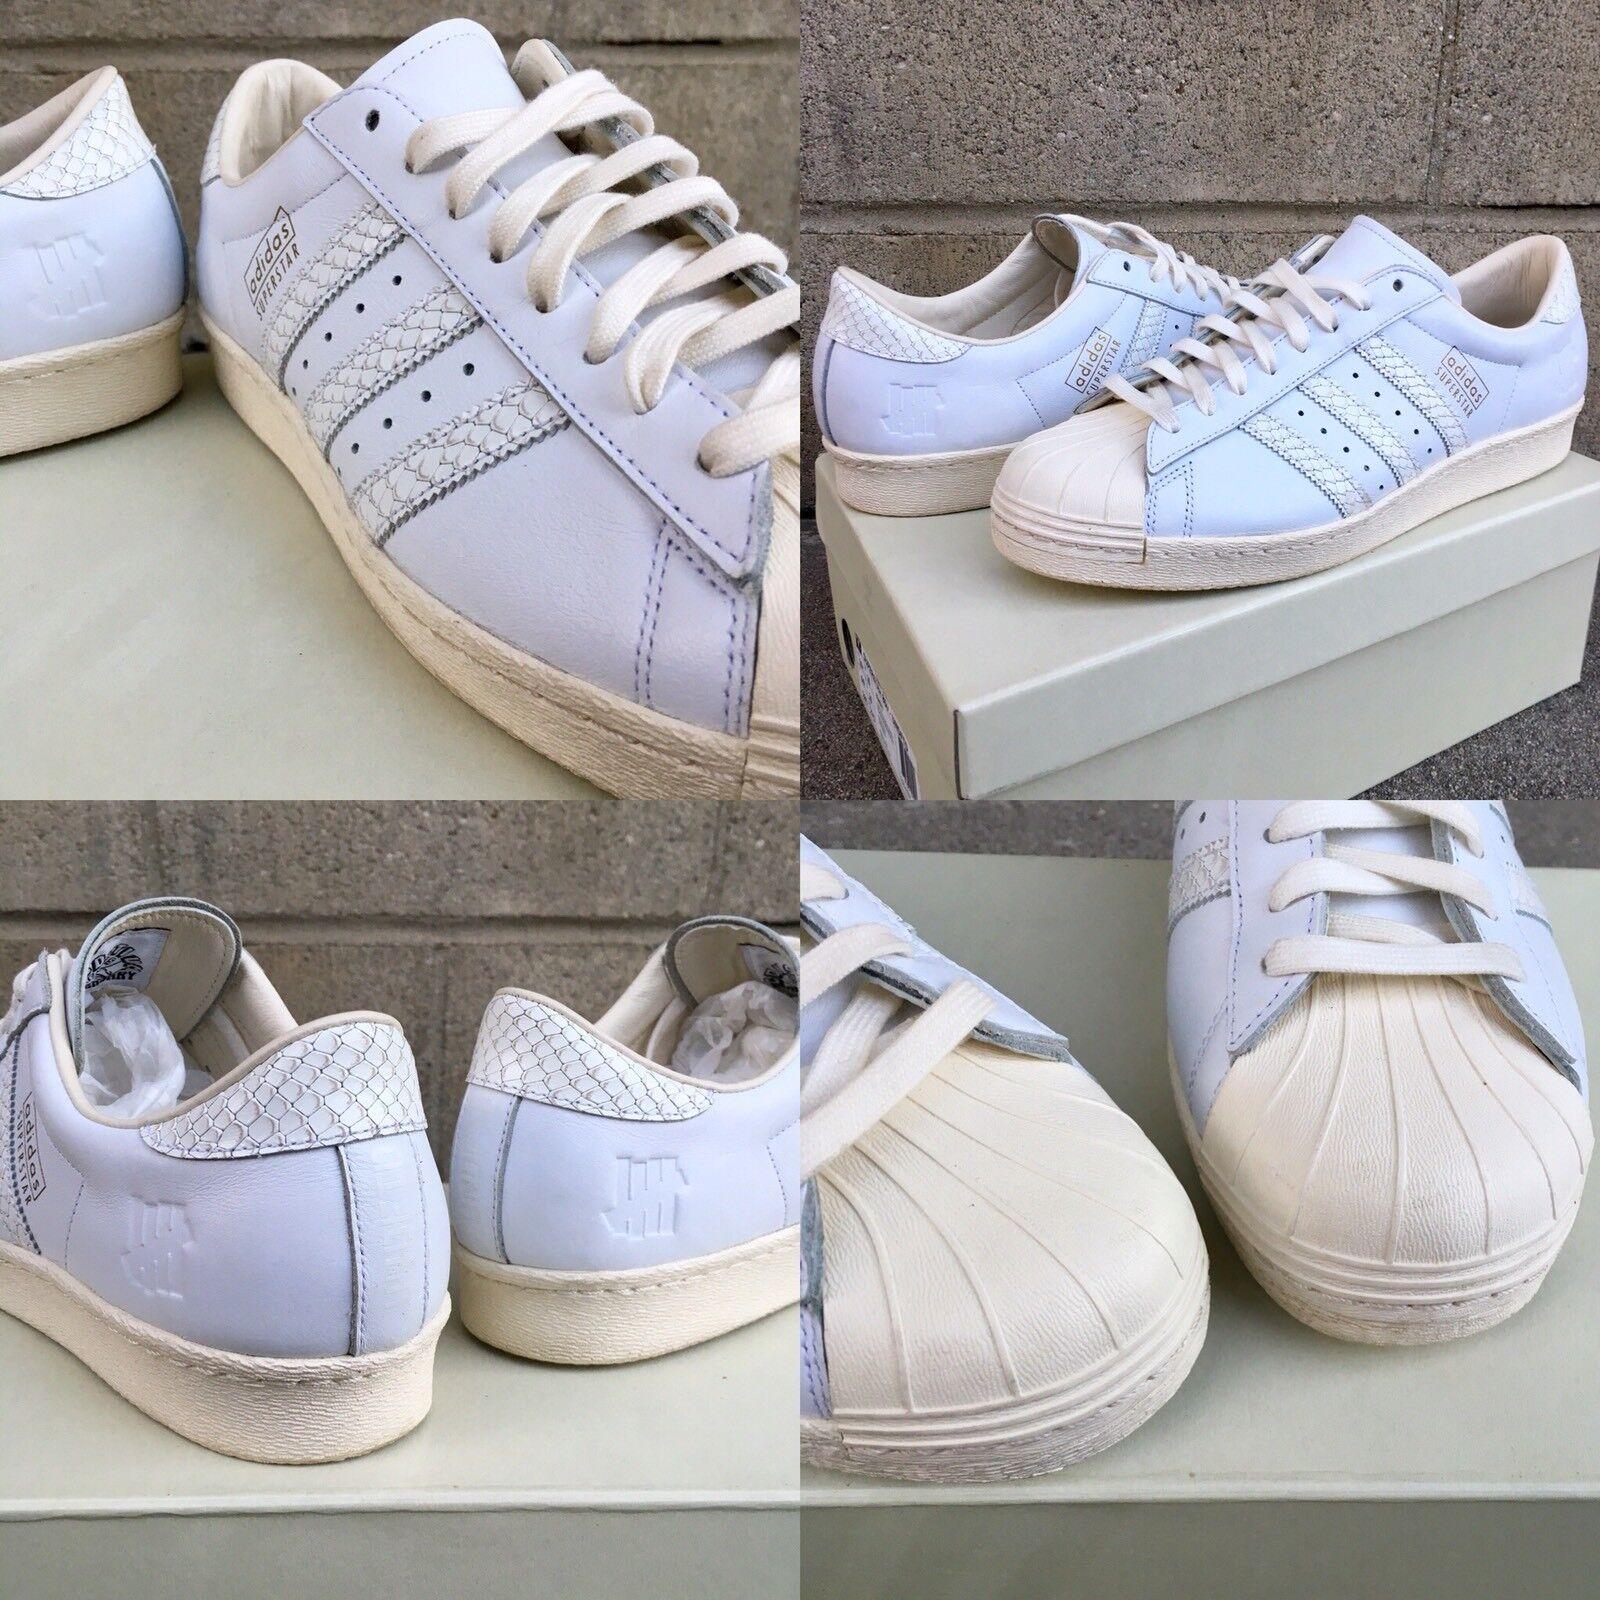 Portati una volta sz 10,5 superstar adidas consorzio x imbattuto superstar 10,5 80v 80 undftd b34077 64c7e3